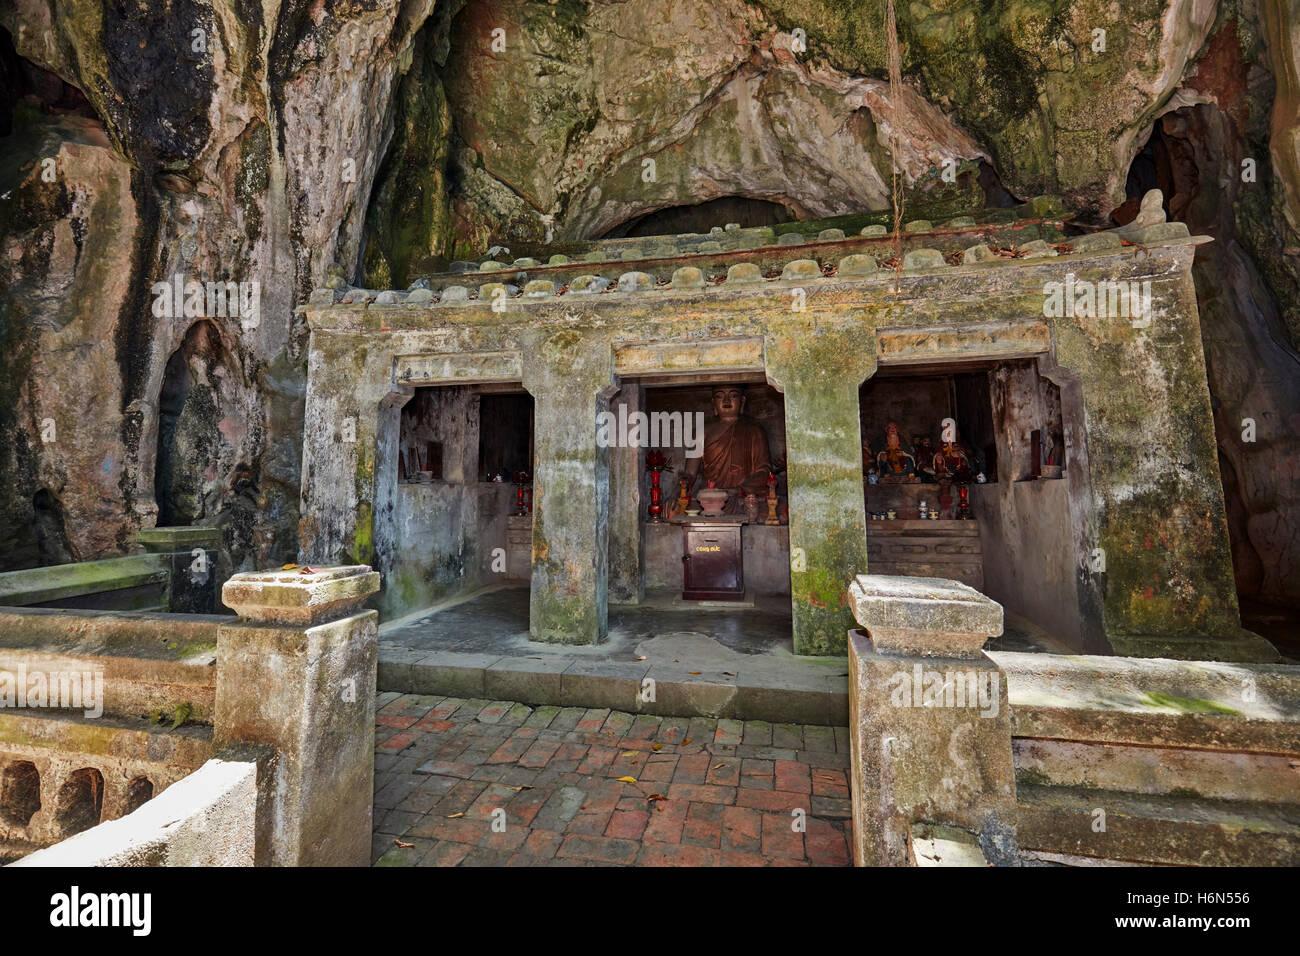 Tang Chon Cave. Thuy Son Mountain, The Marble Mountains, Da Nang, Vietnam. - Stock Image